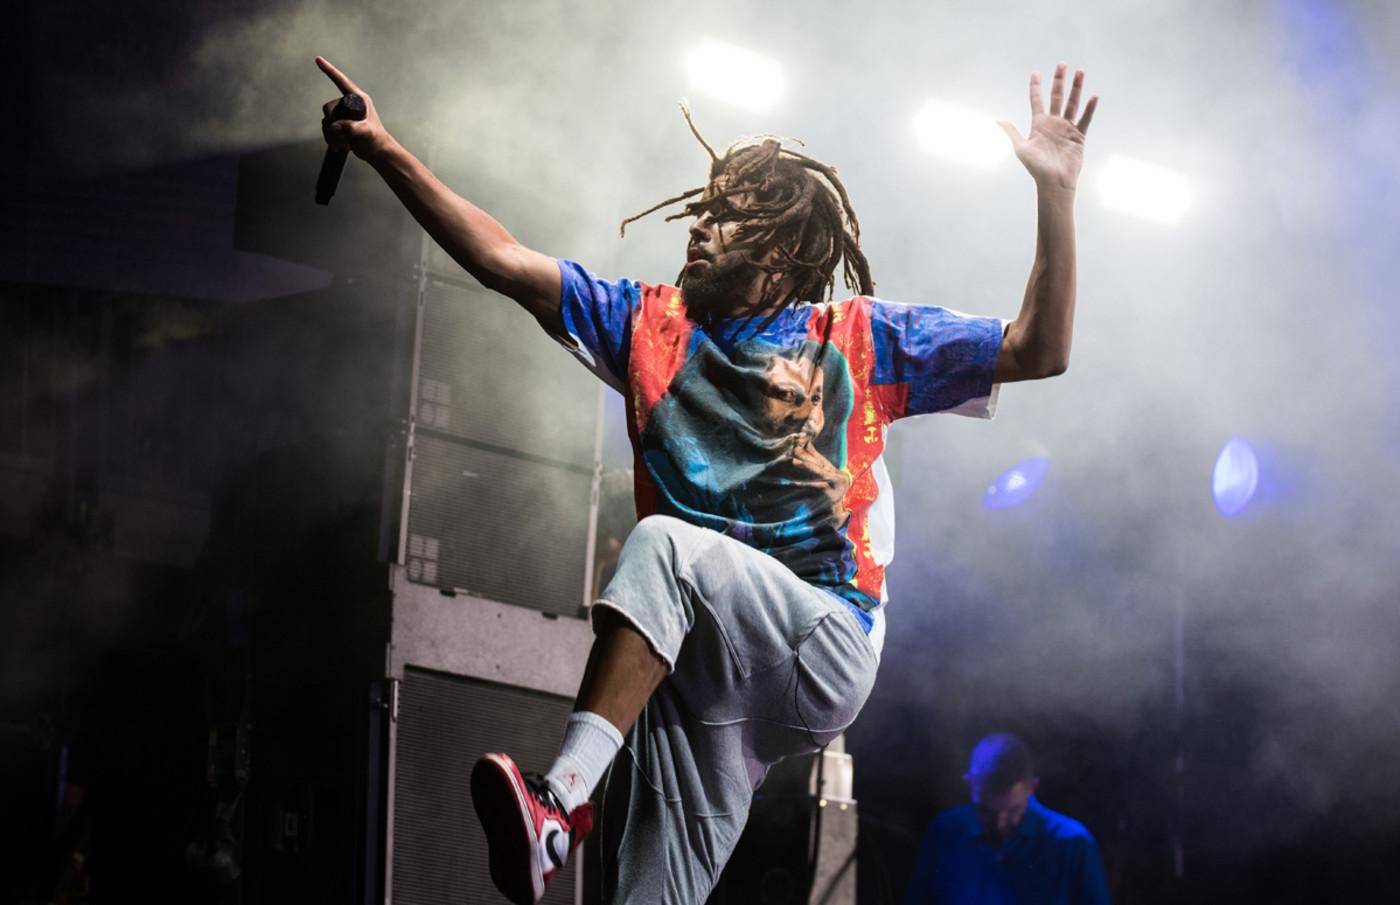 j-cole-dancing-getty-joseph-okpako